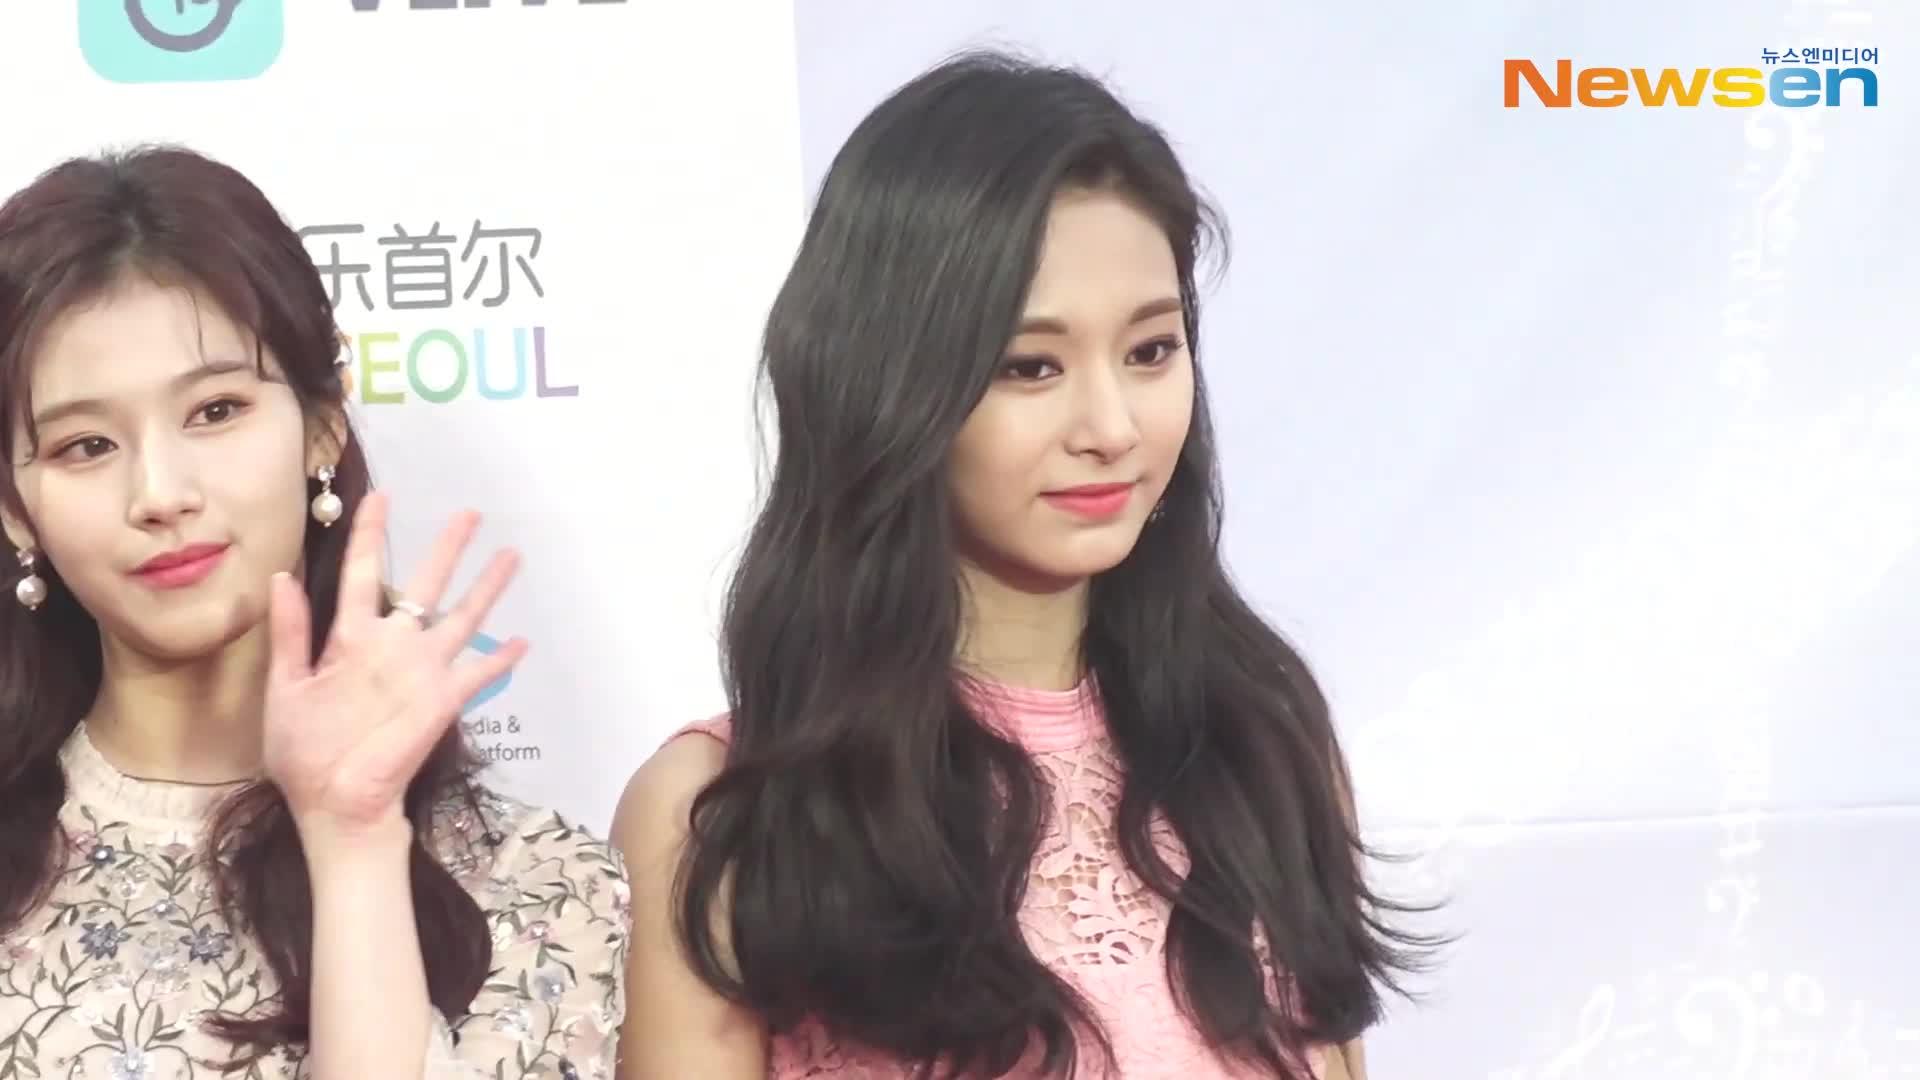 celebs, chaeyoung, jeongyeon, kpop, sana, twice, tzuyu, Twice GIFs